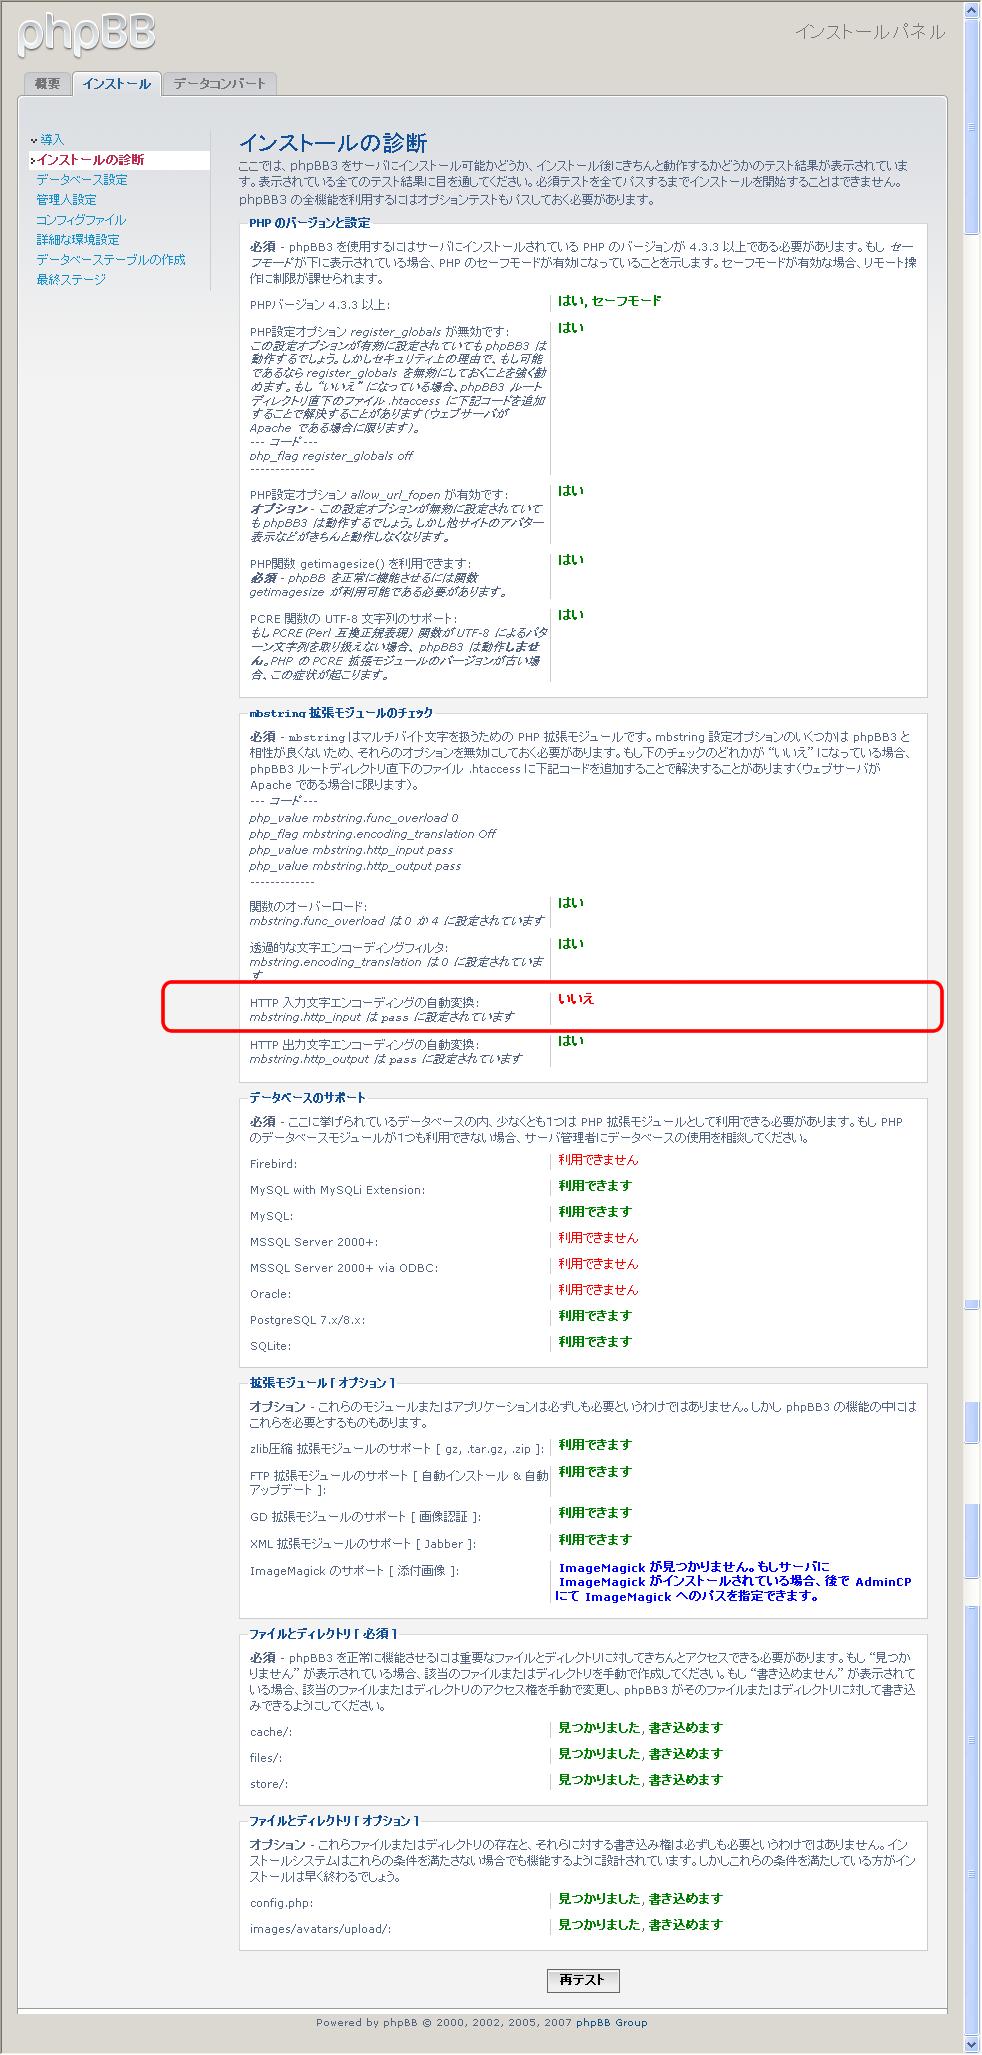 phpBB3インストールチェック